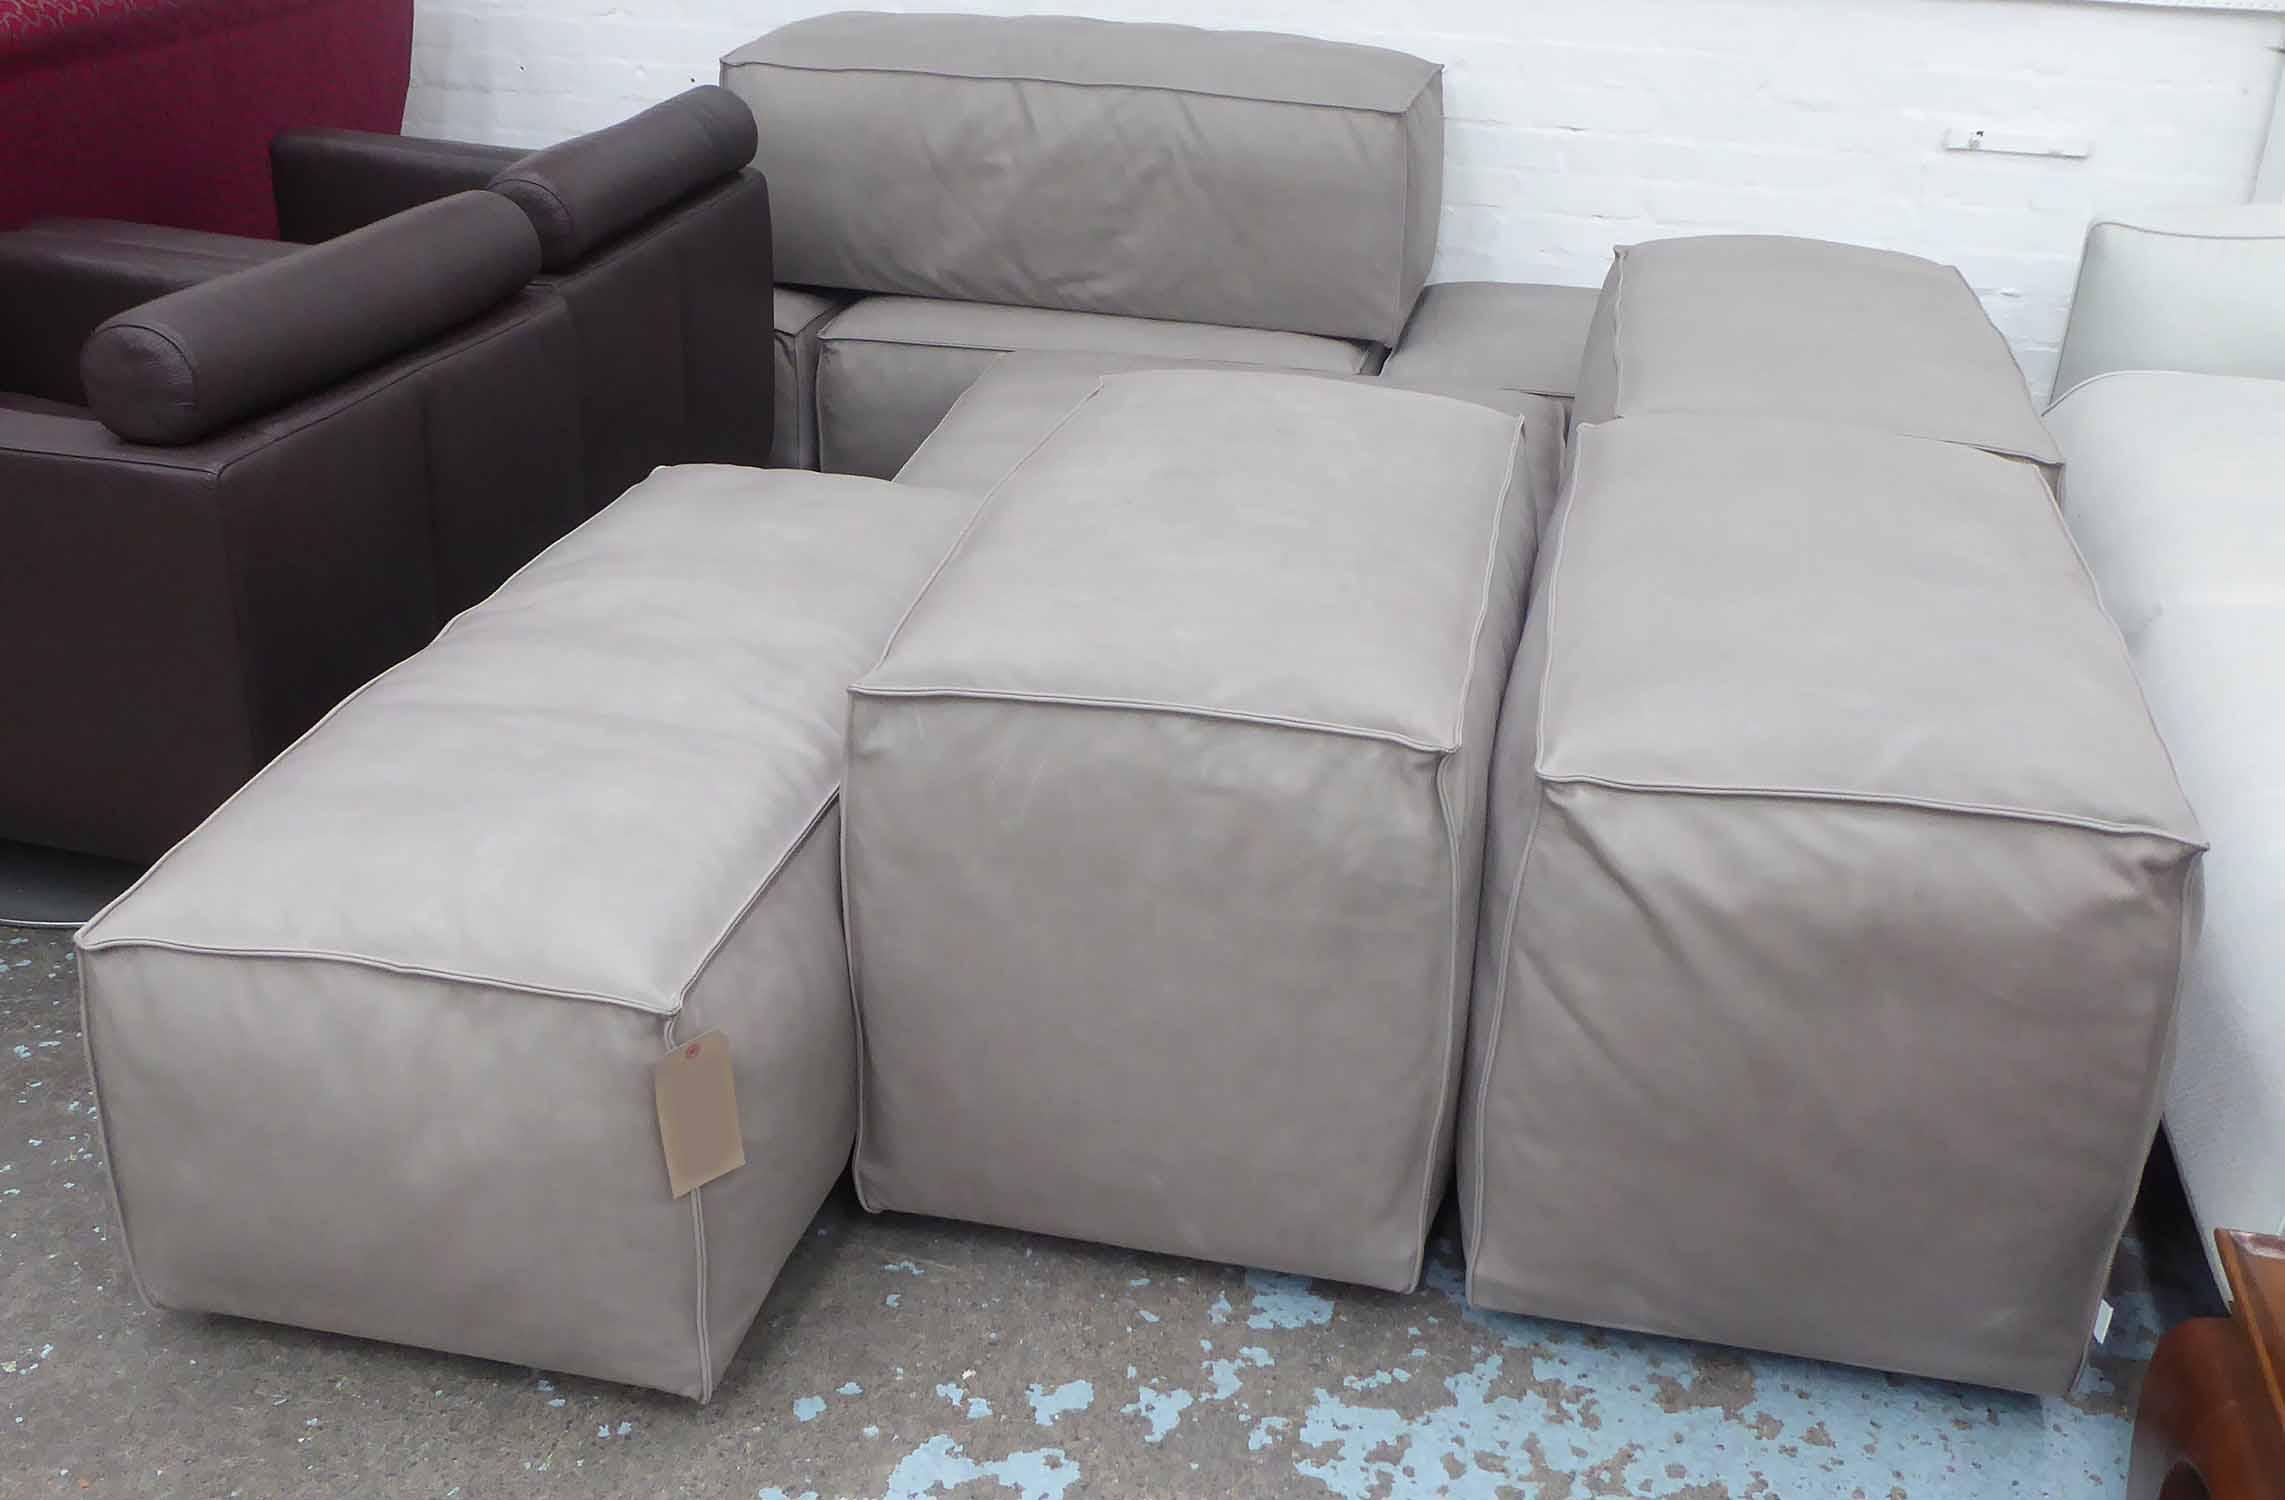 Divani Low Cost.Living Divani Modular Sofa By Piero Lissoni Grey Upholstered Of